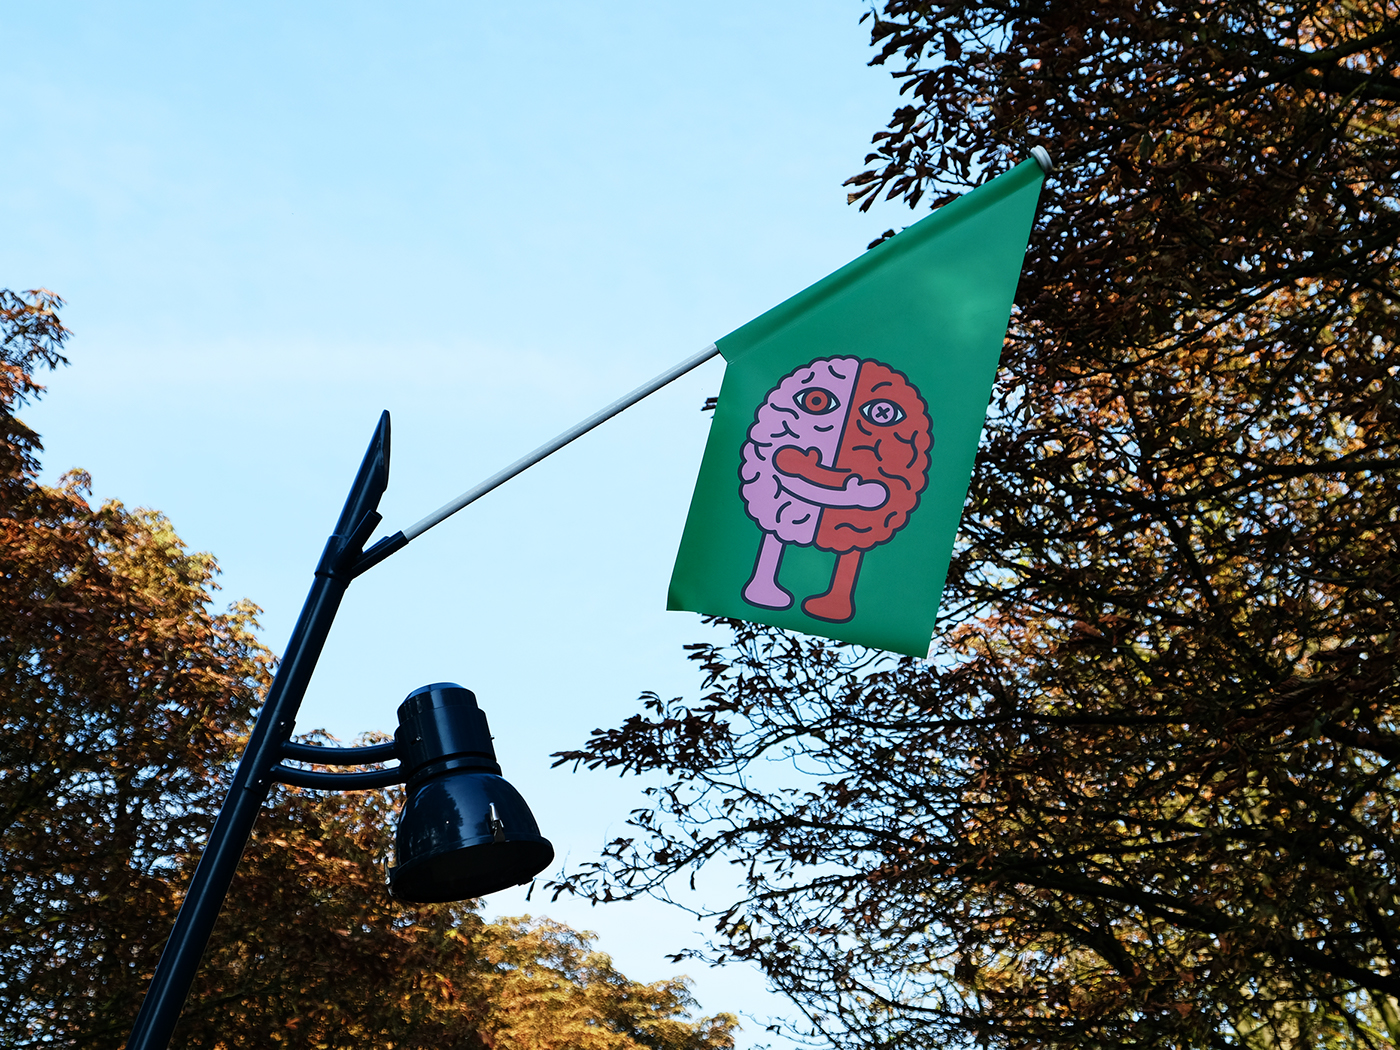 Graphic Matters more hugs Ken Lo flags public art community peace breda Netherlands